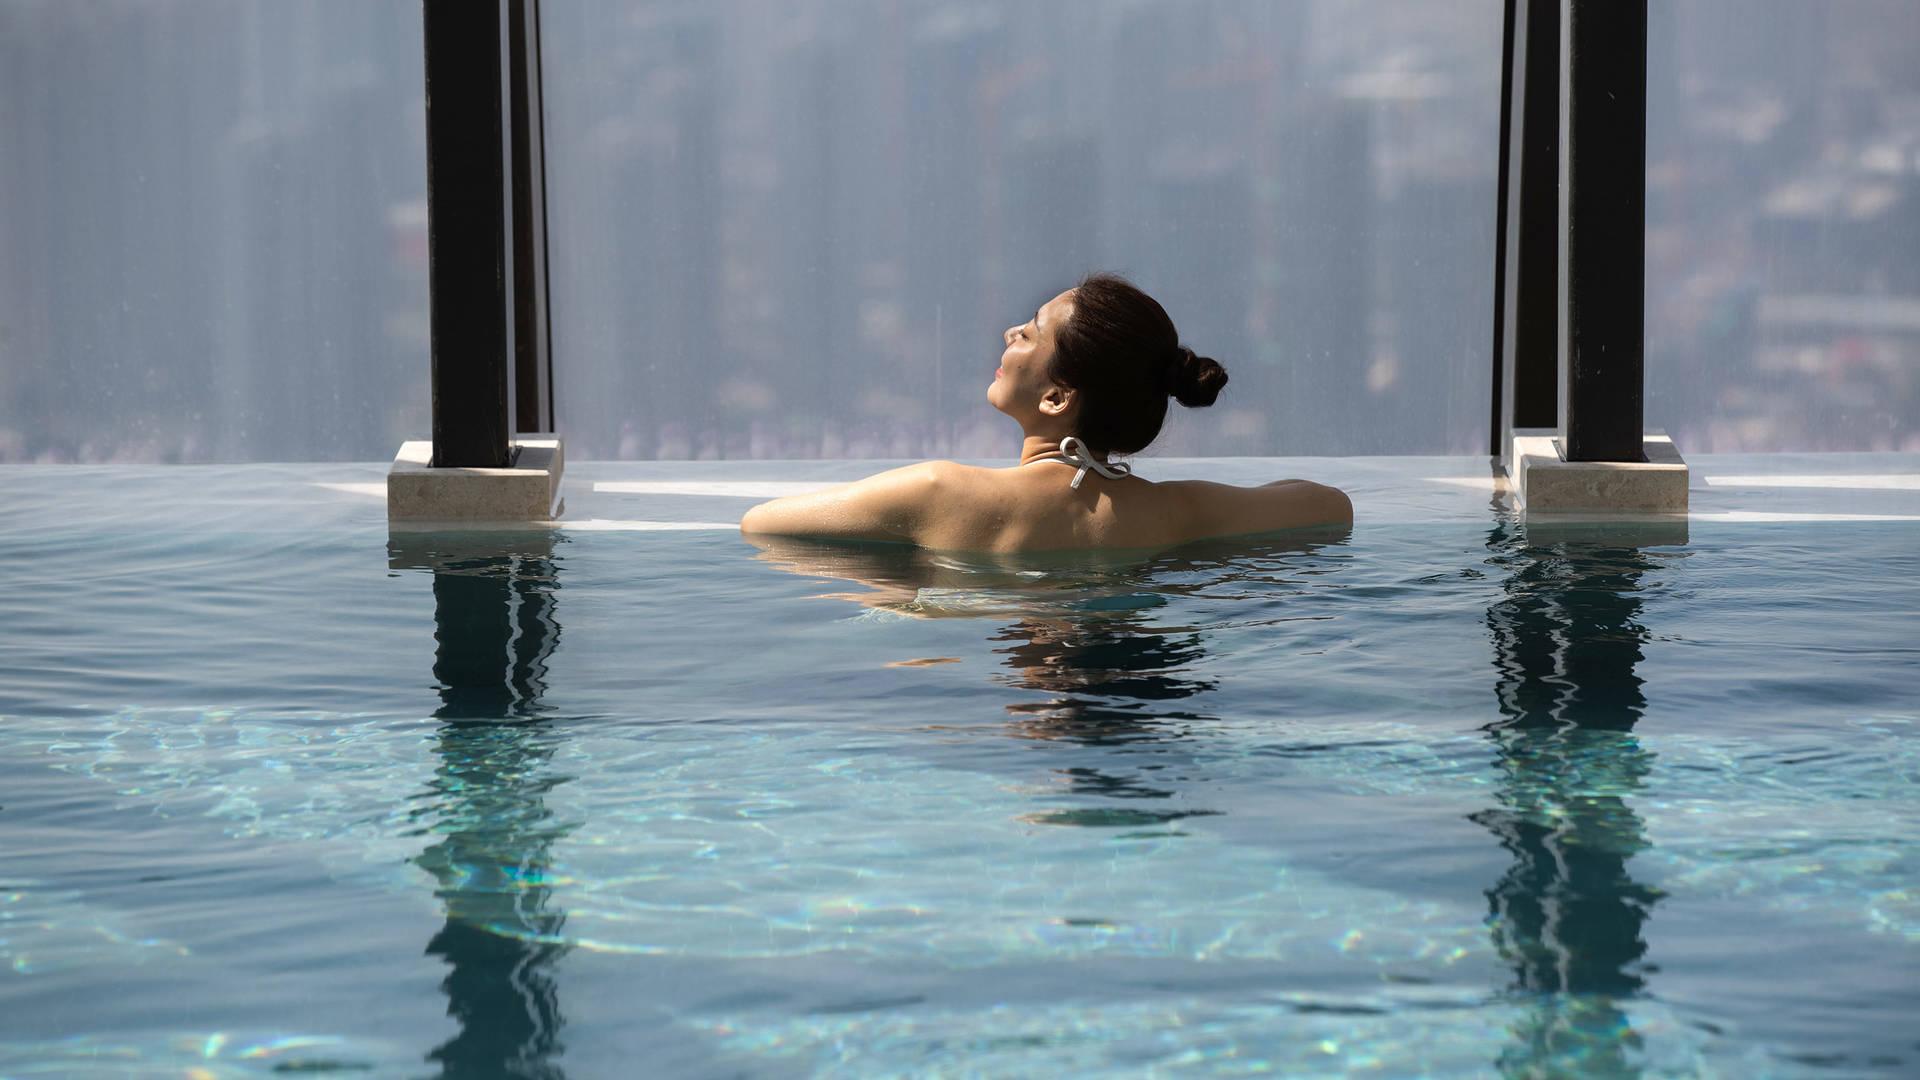 Jumeirah Nanjing leisure woman in the pool_16-9